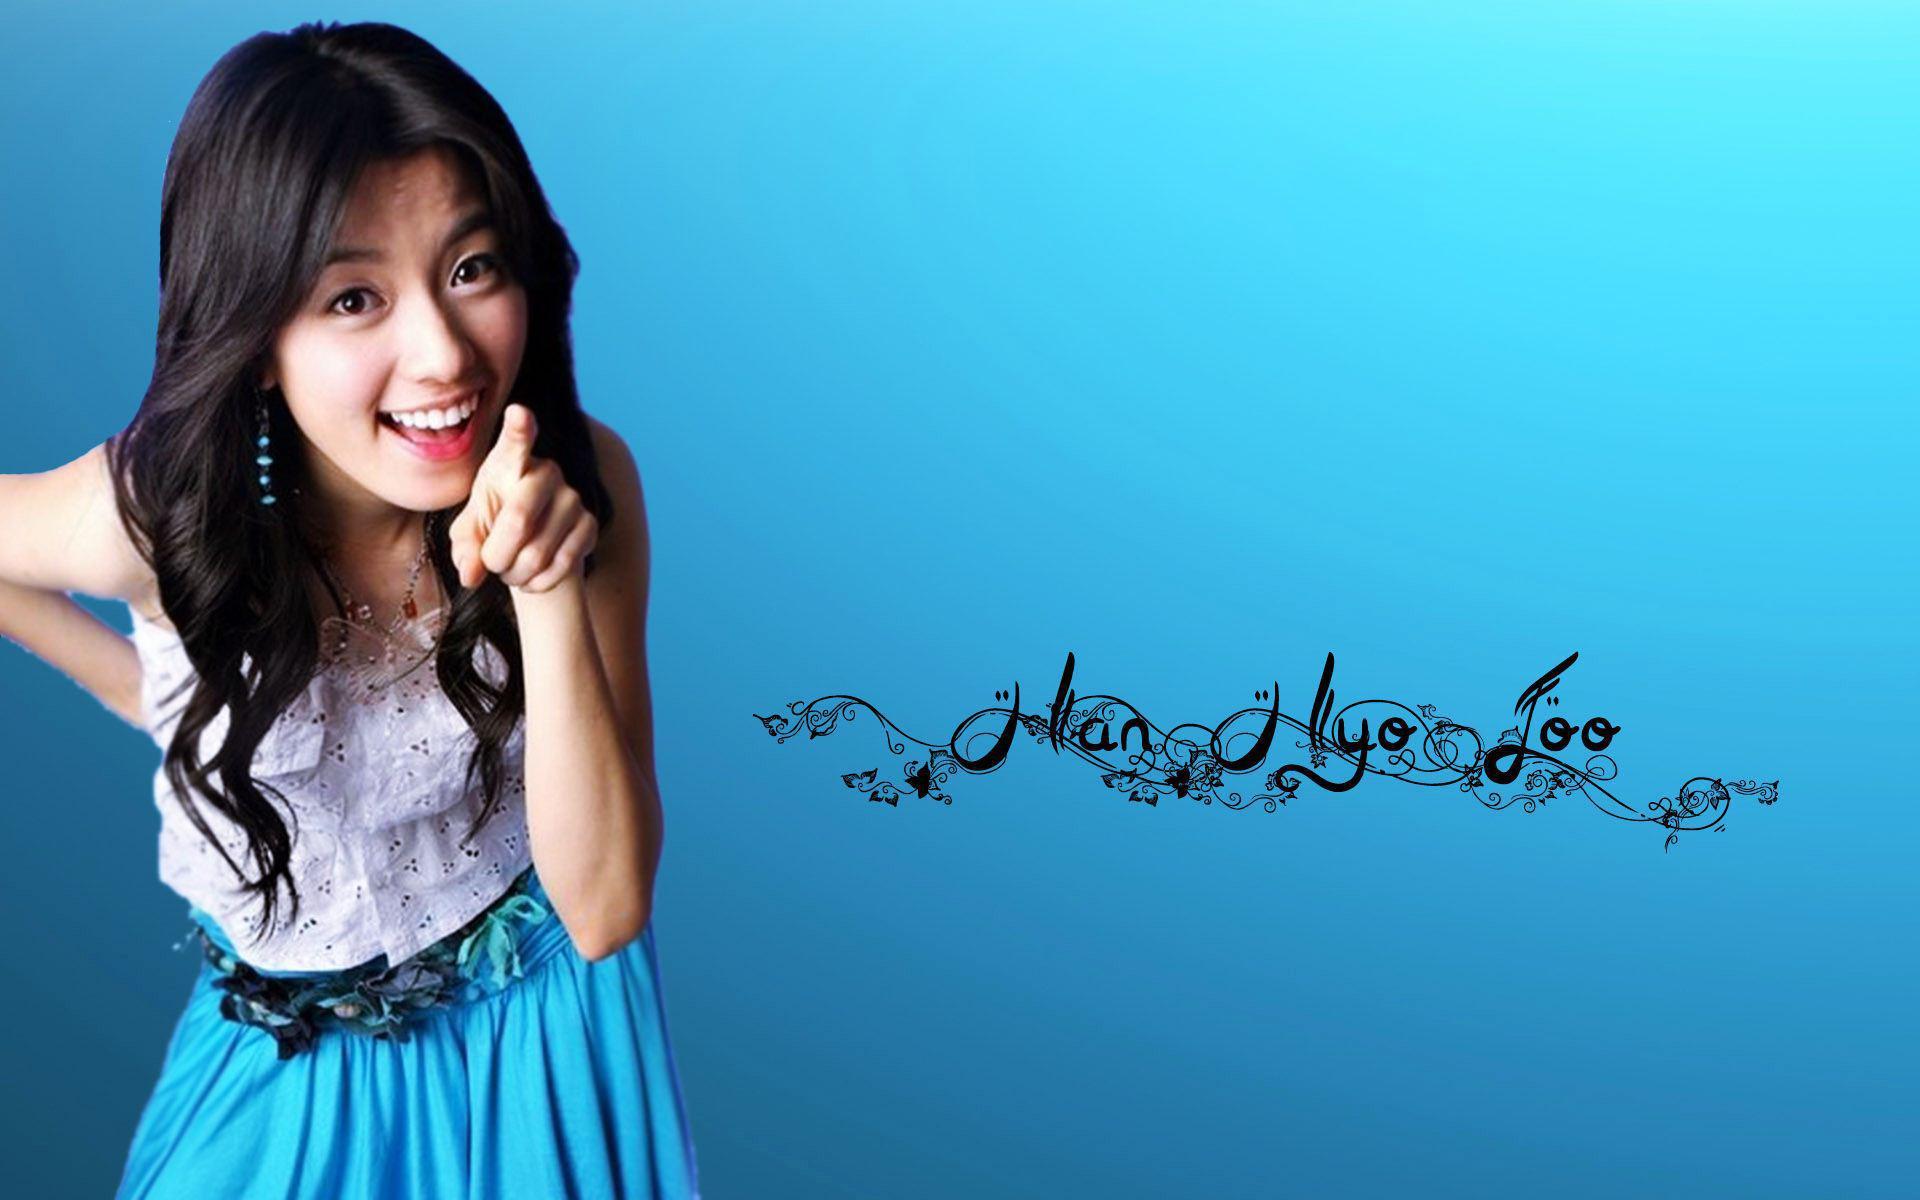 Han Hyo Joo 4K